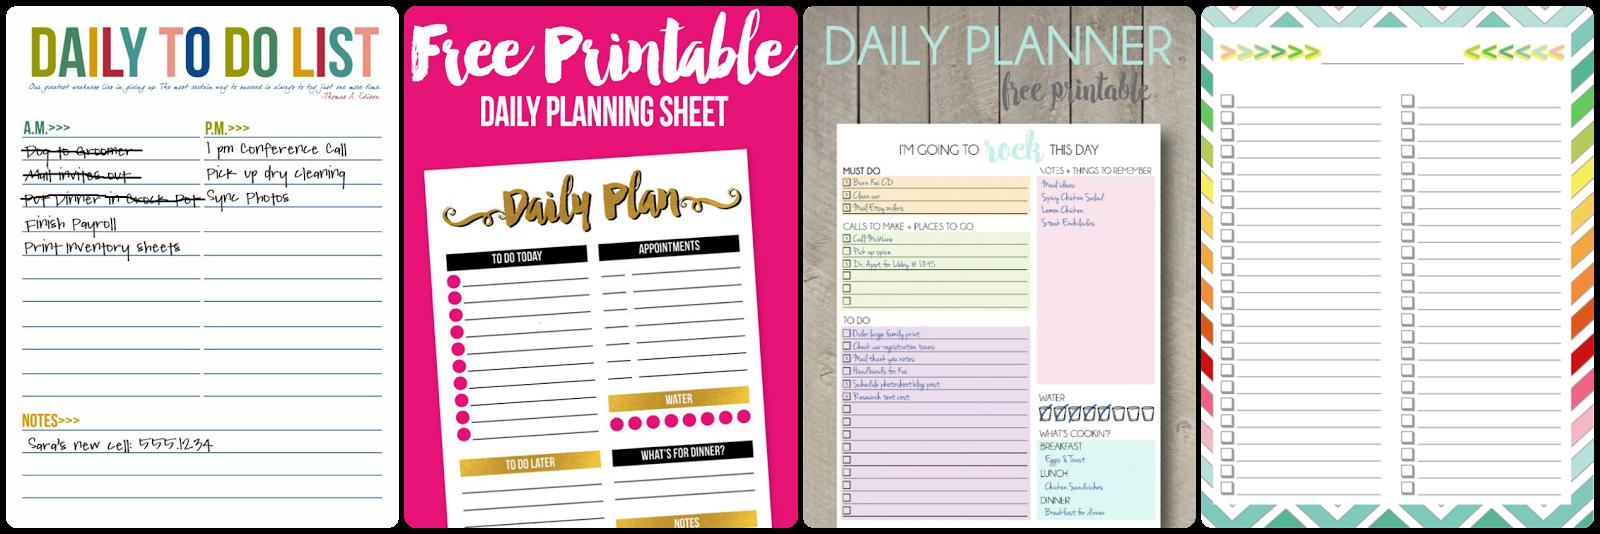 Lisa is Busy Nerding: 10 Free Organizational Printables to